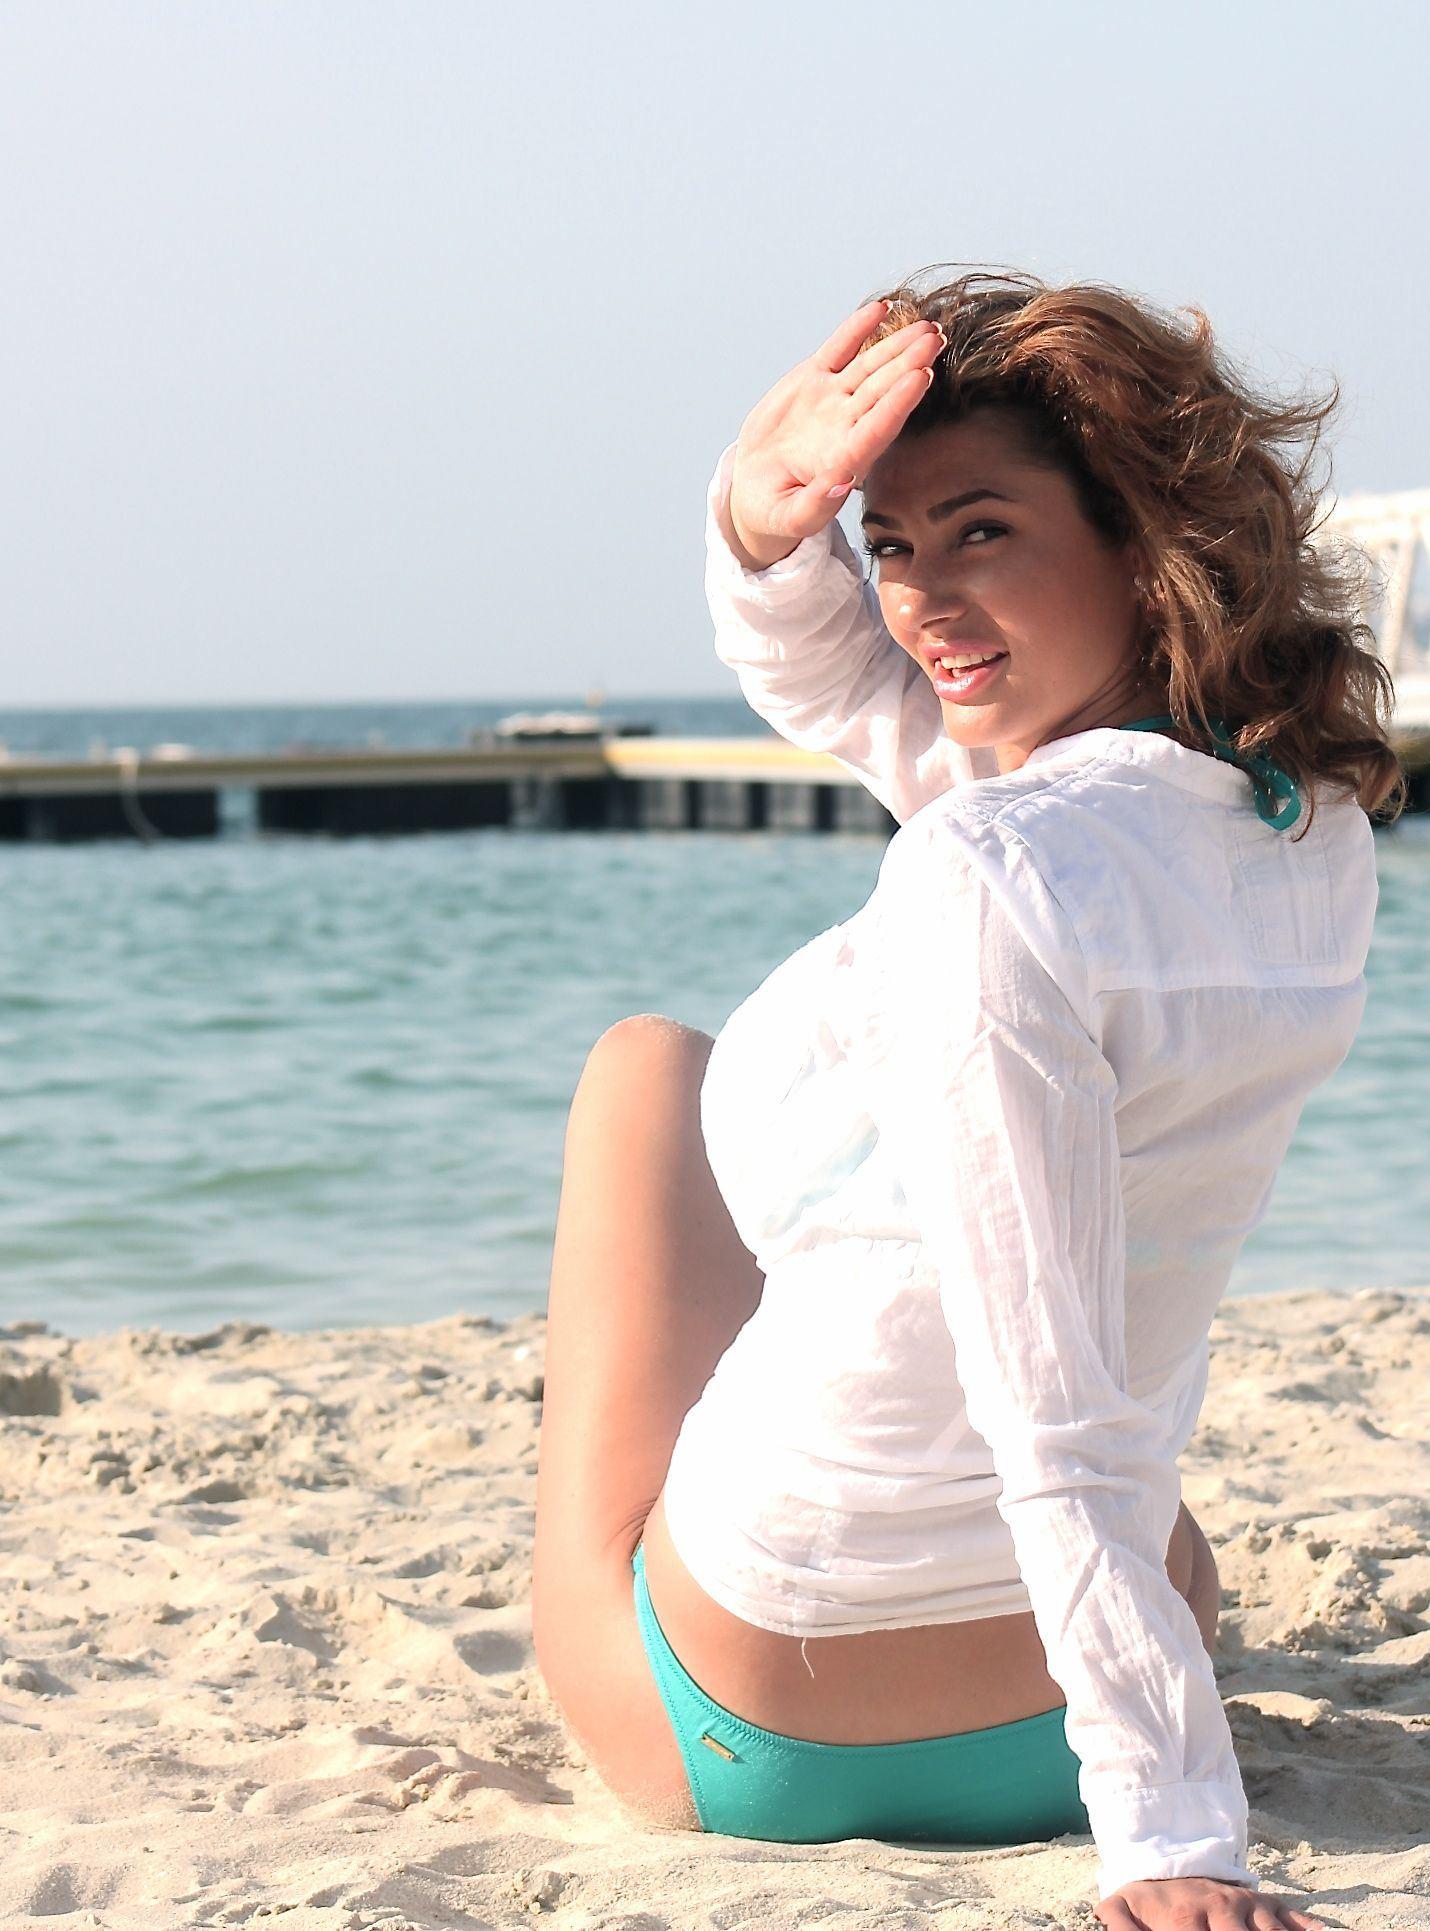 FA005460 - Fame Model Agency Dubai - Fame Model Agency Dubai